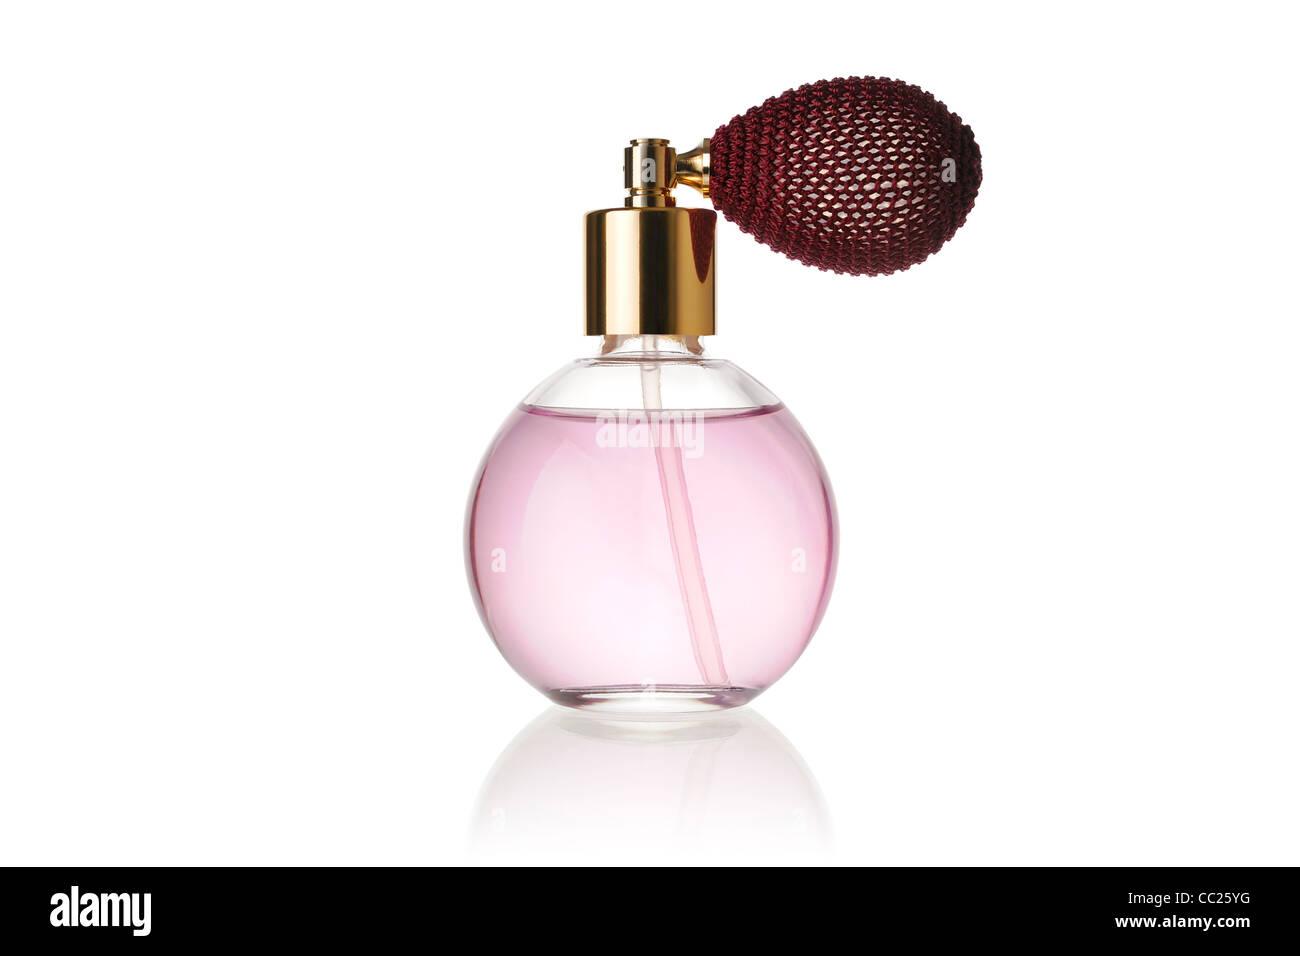 Perfume Bottle Against a White Background Stock Photo